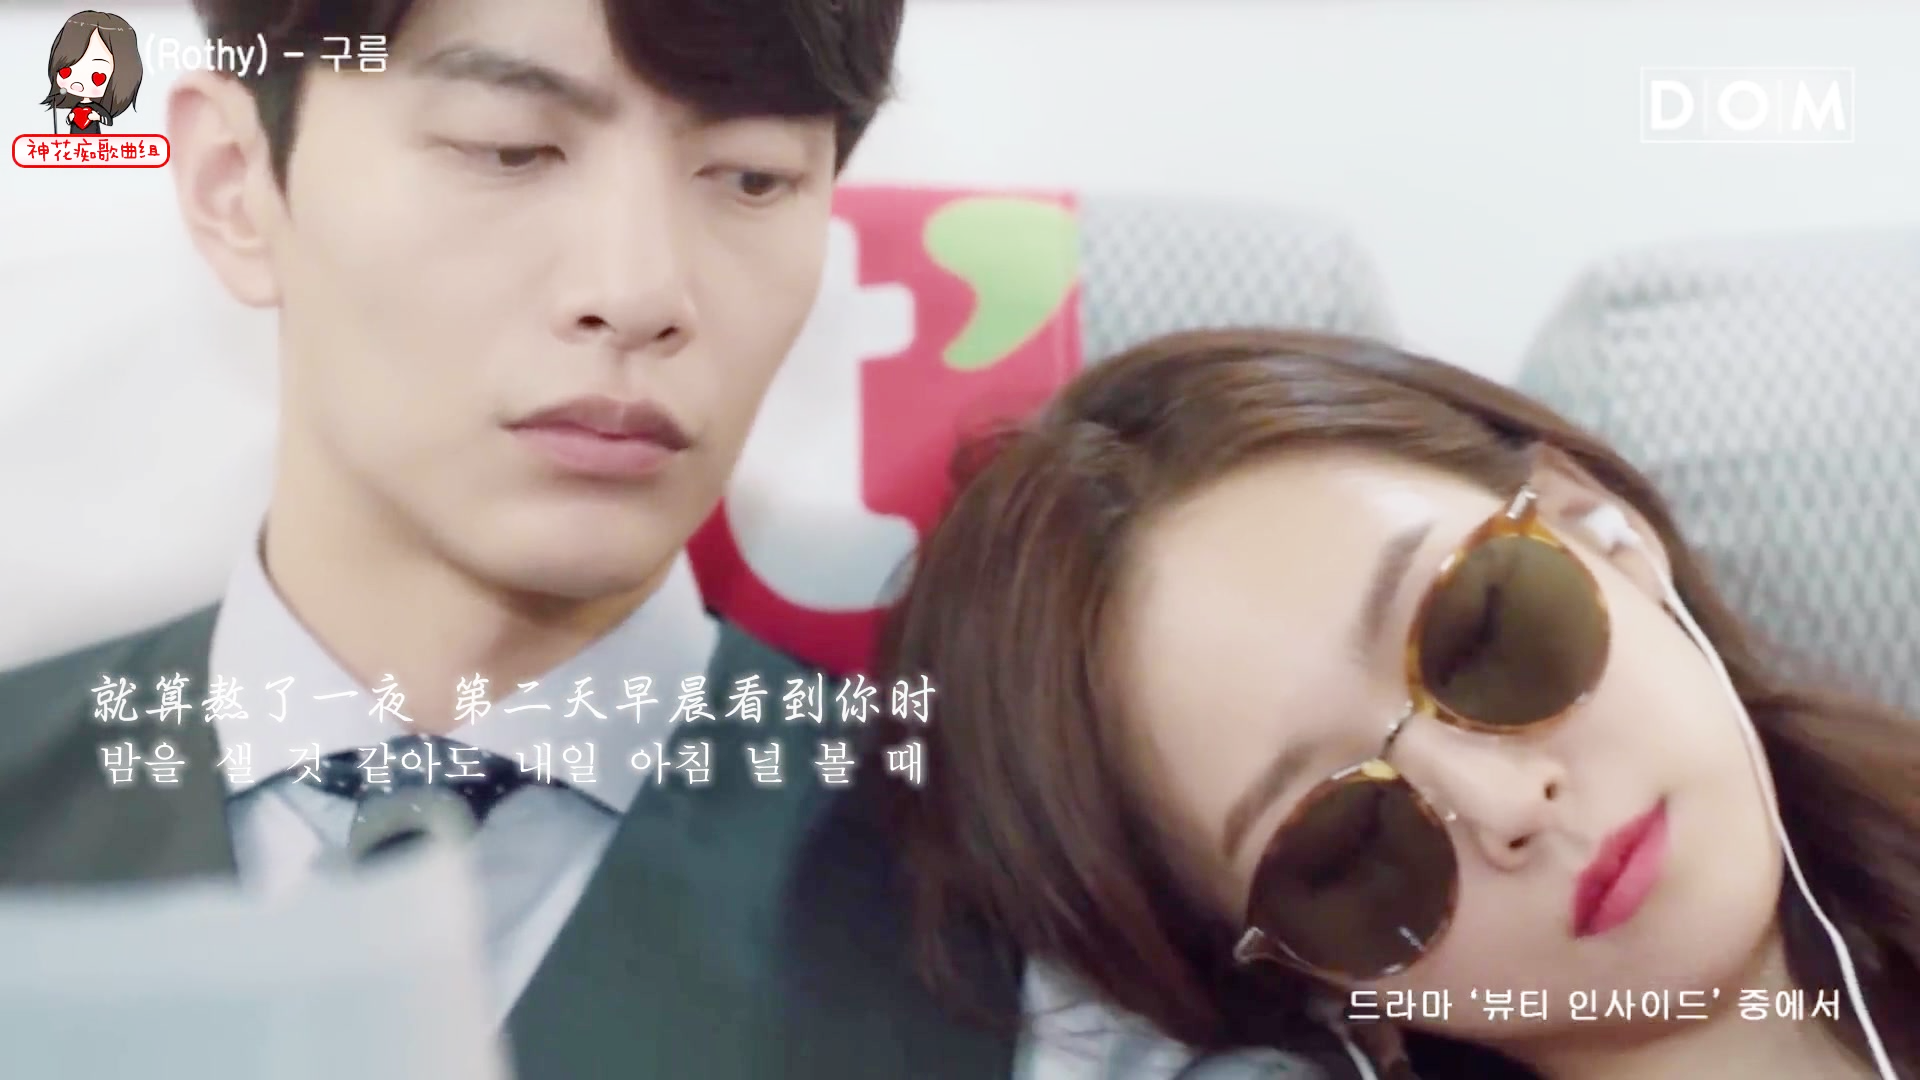 Rothy-Cloud 内在美MV OST 中韩双语1080P